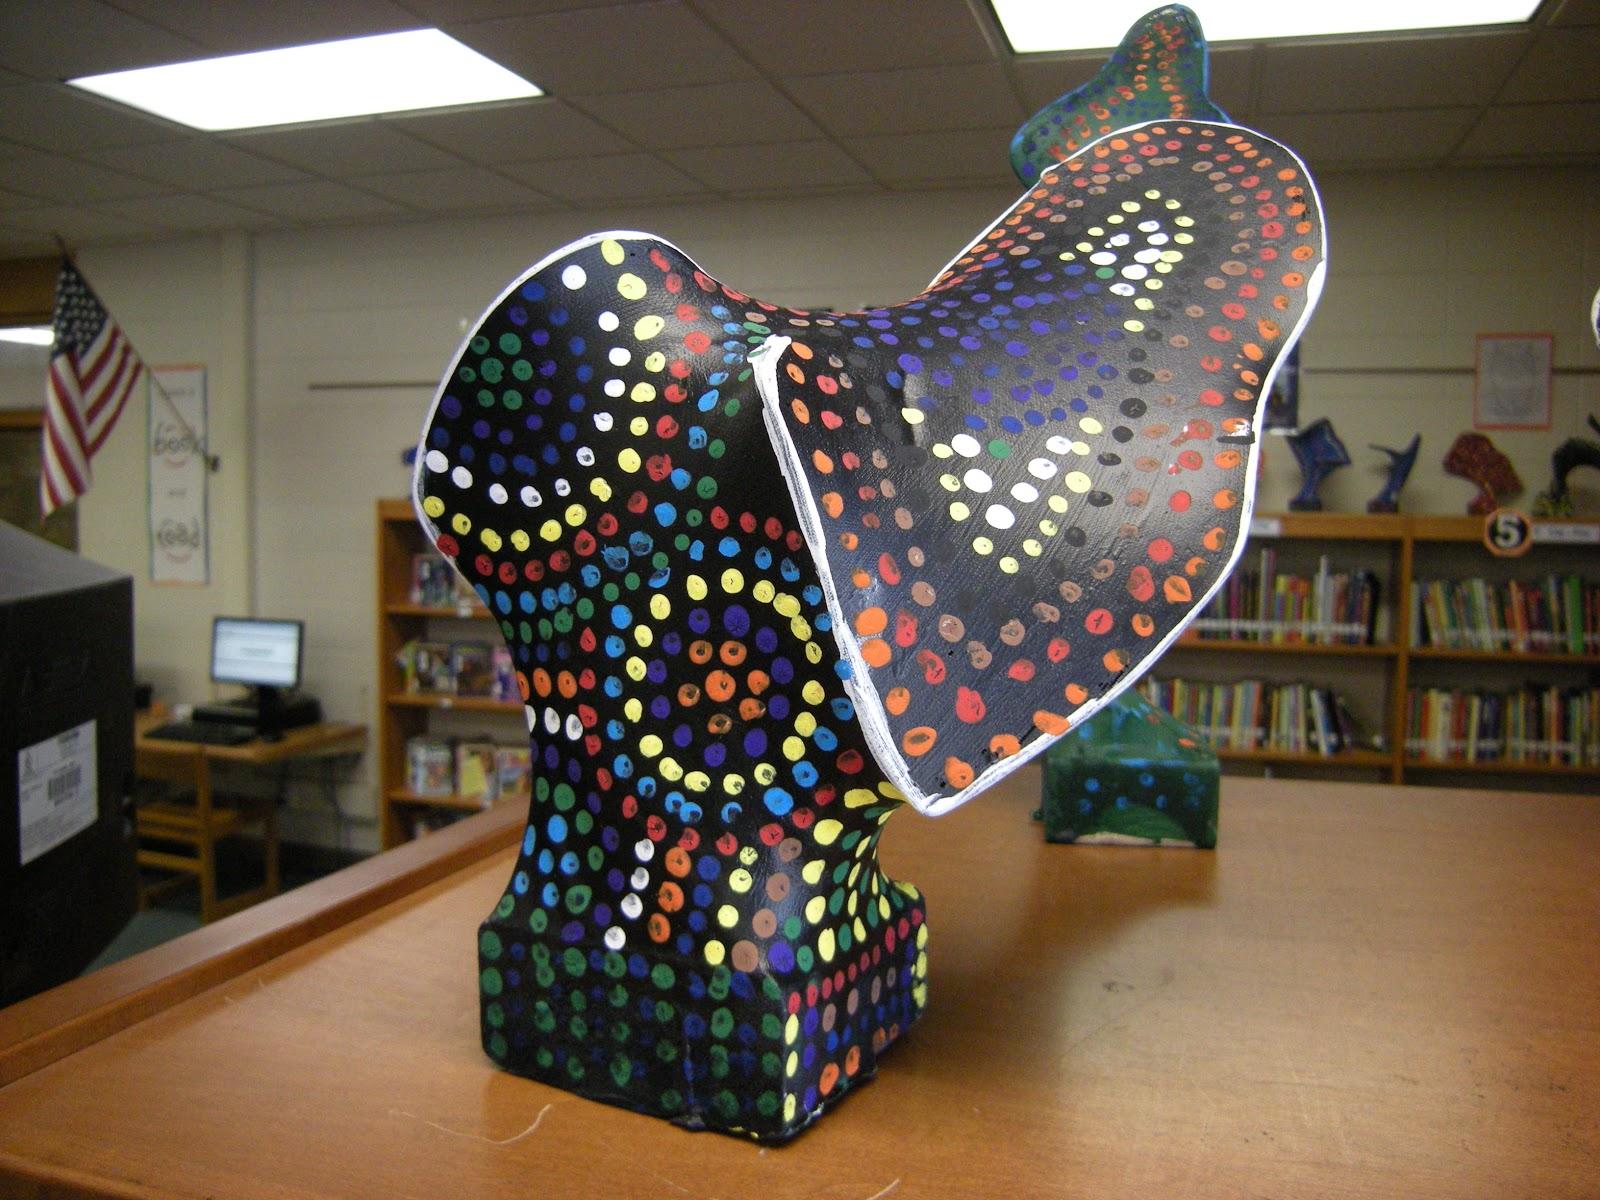 Remarkable, art pantyhose sculpture